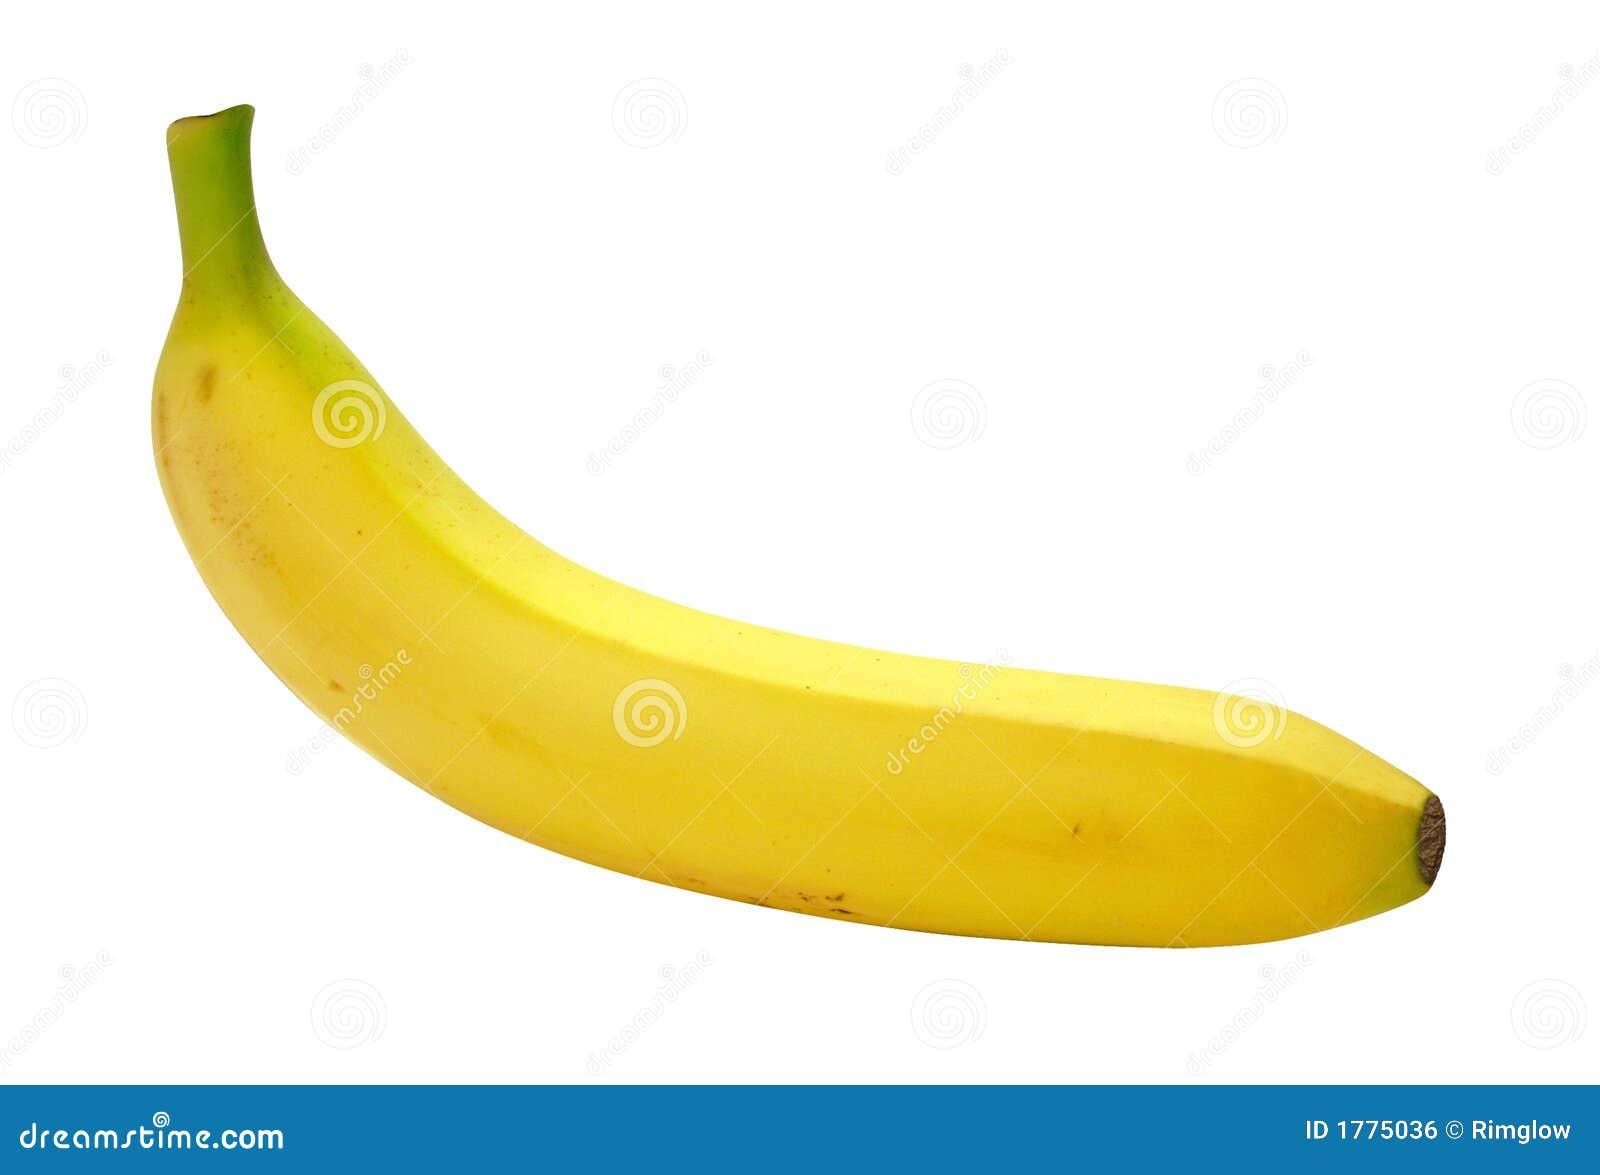 [Image: banana-1775036.jpg]